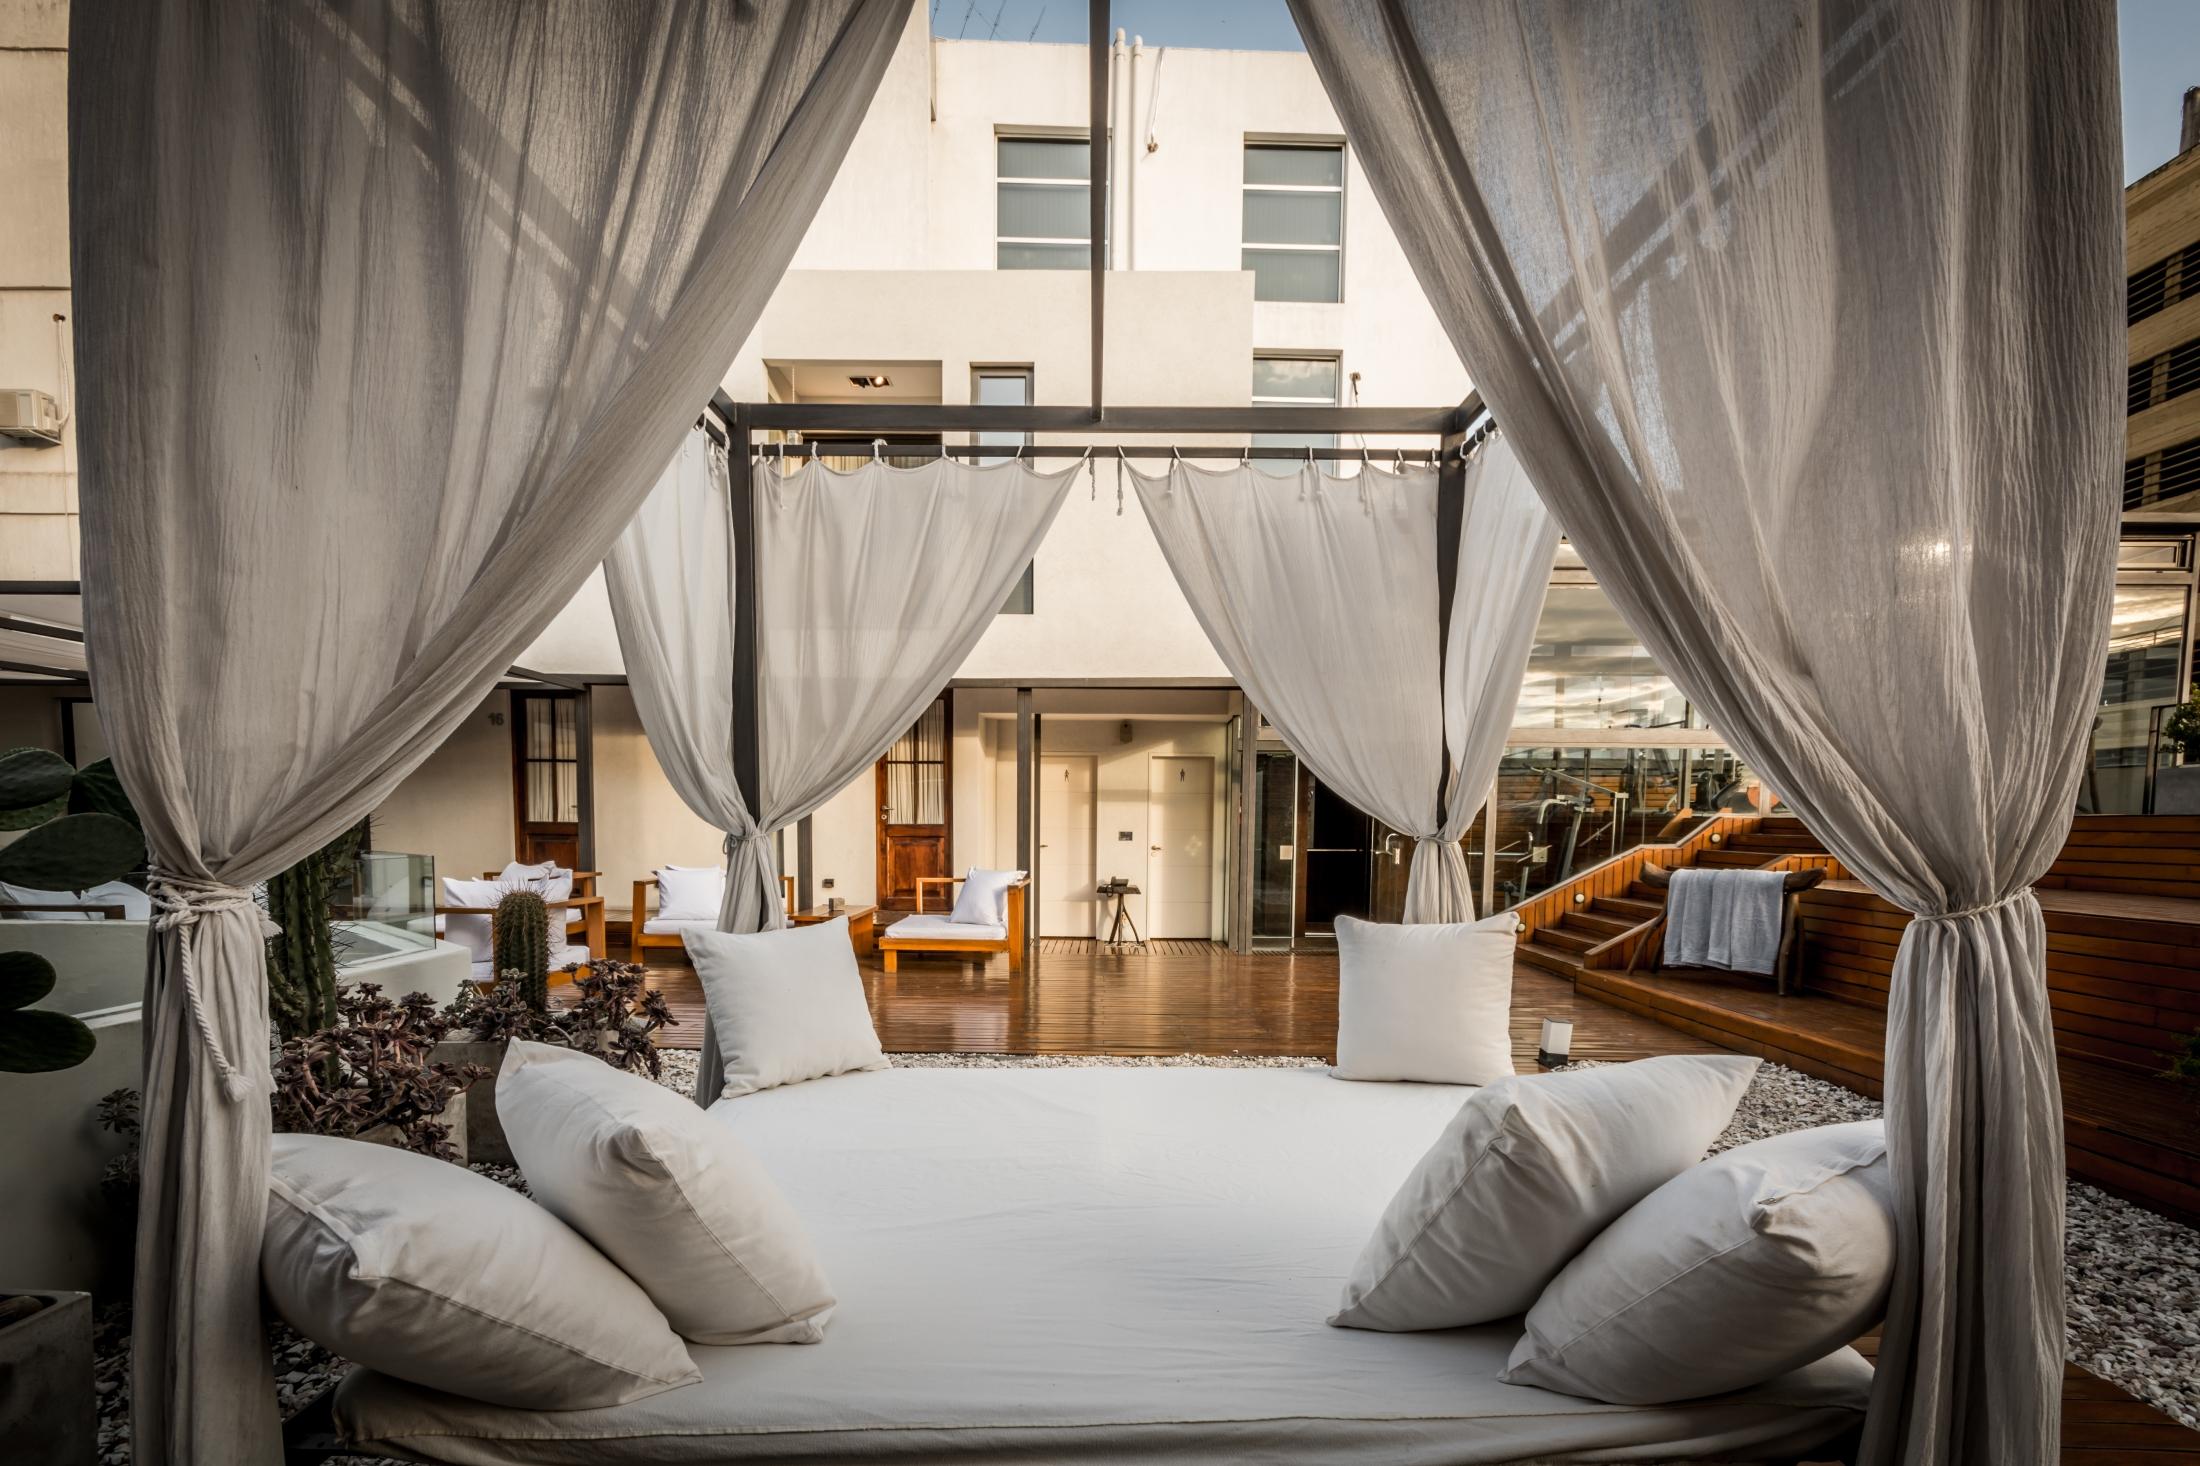 Hotel Azur ph2 G Viramonte 129